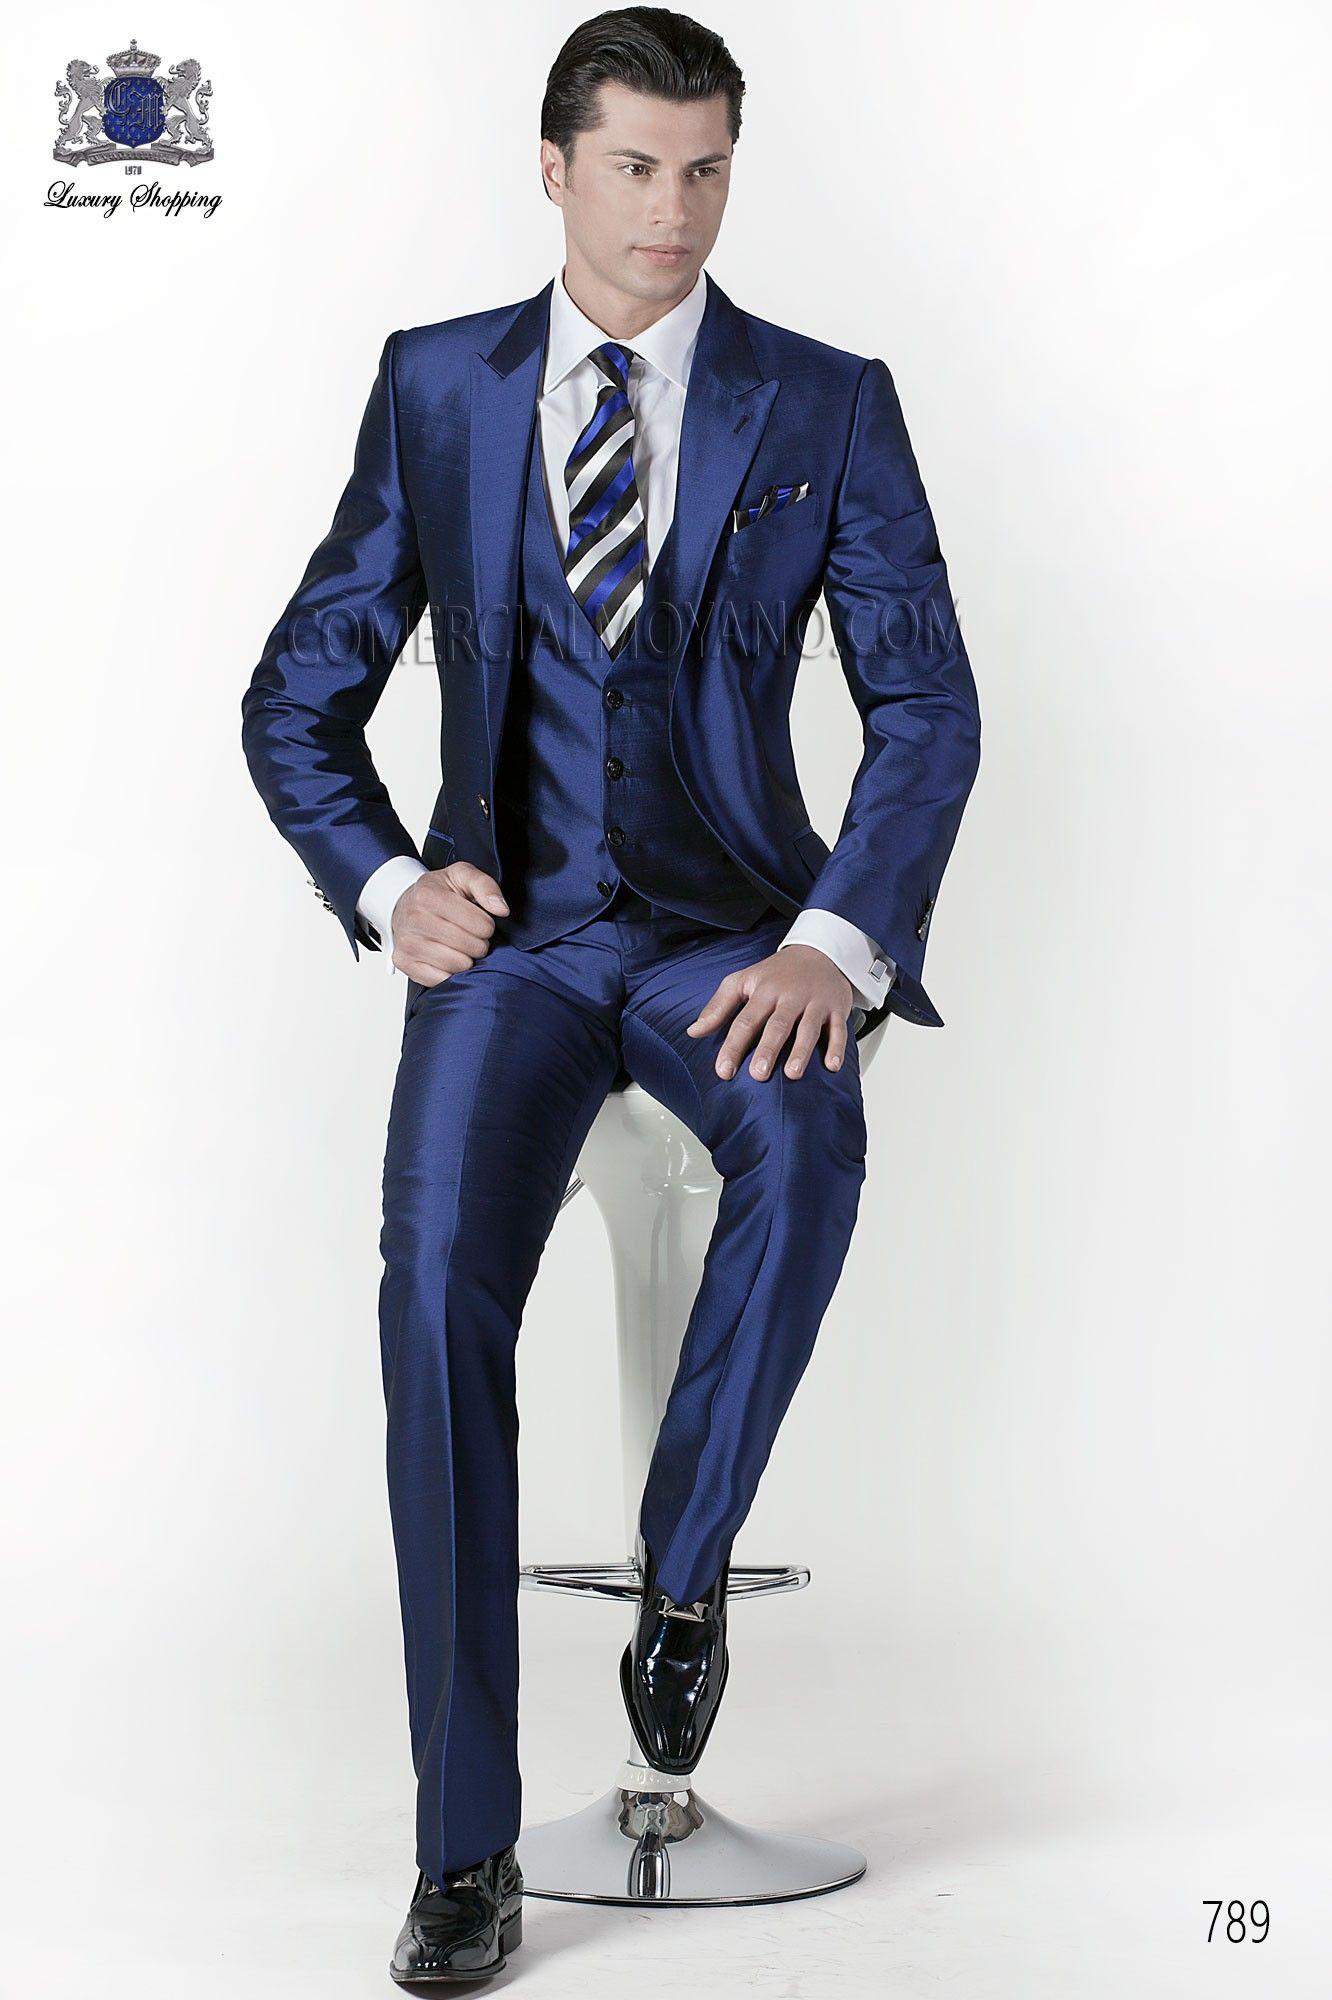 563b695cb07 Traje de novio italiano a medida azul 3 piezas